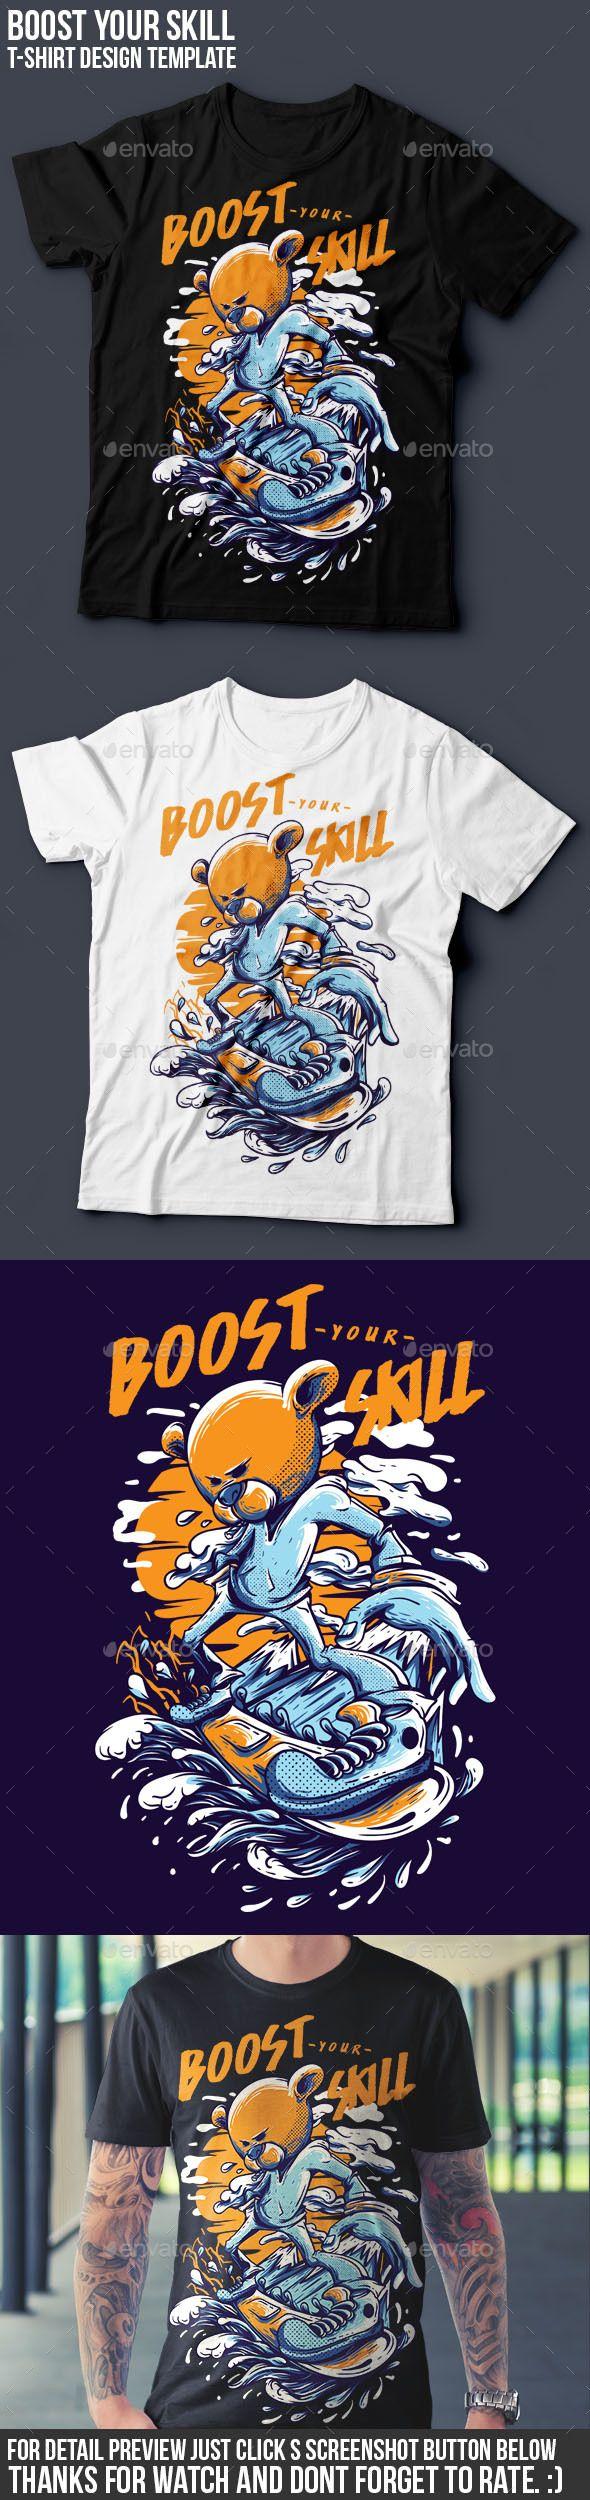 Shirt design template size - Boost Your Skill T Shirt Design